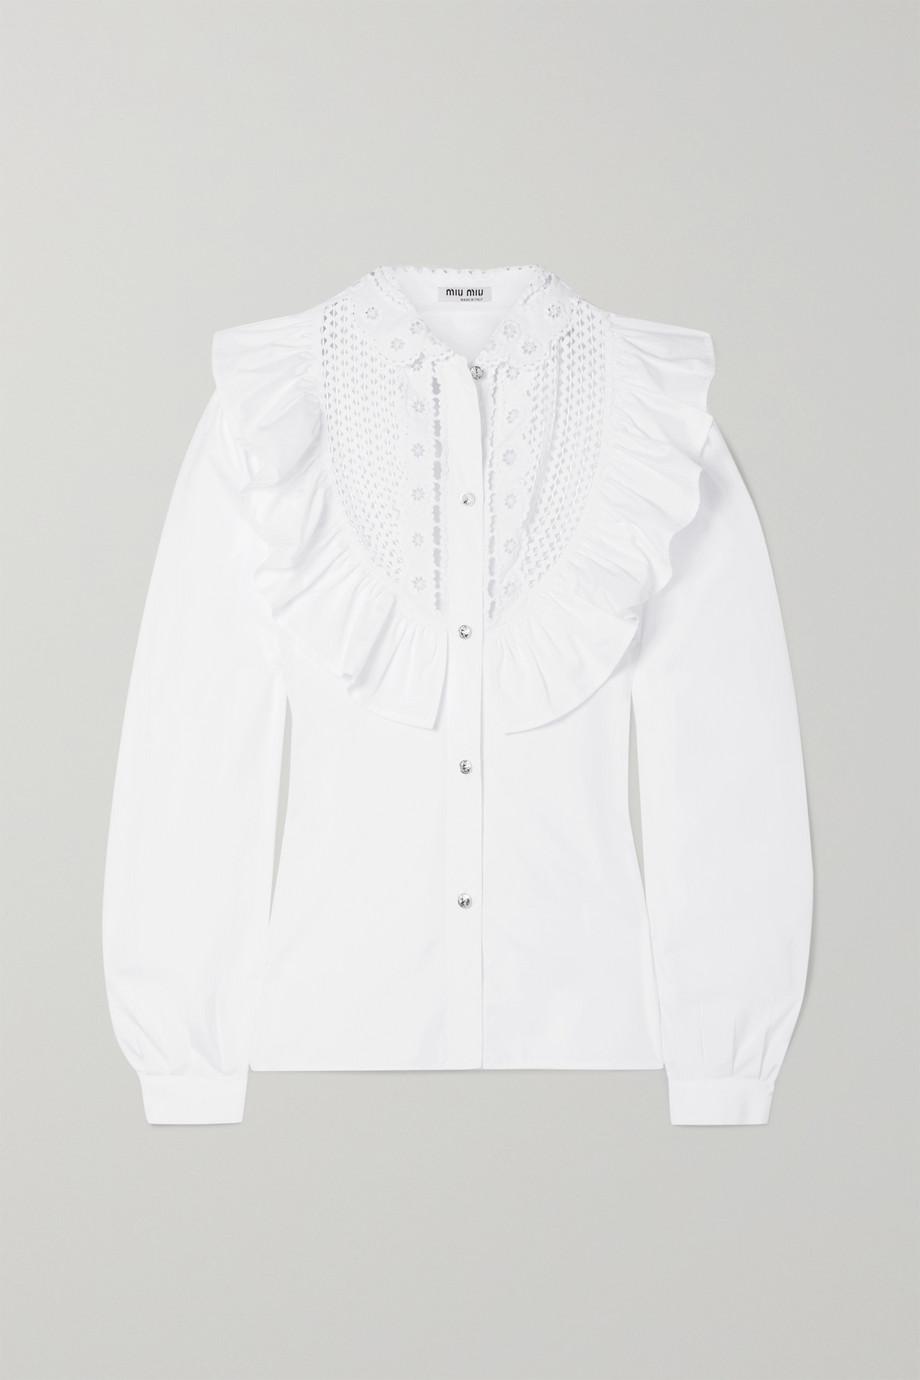 Miu Miu Crystal-embellished ruffled cotton-poplin blouse